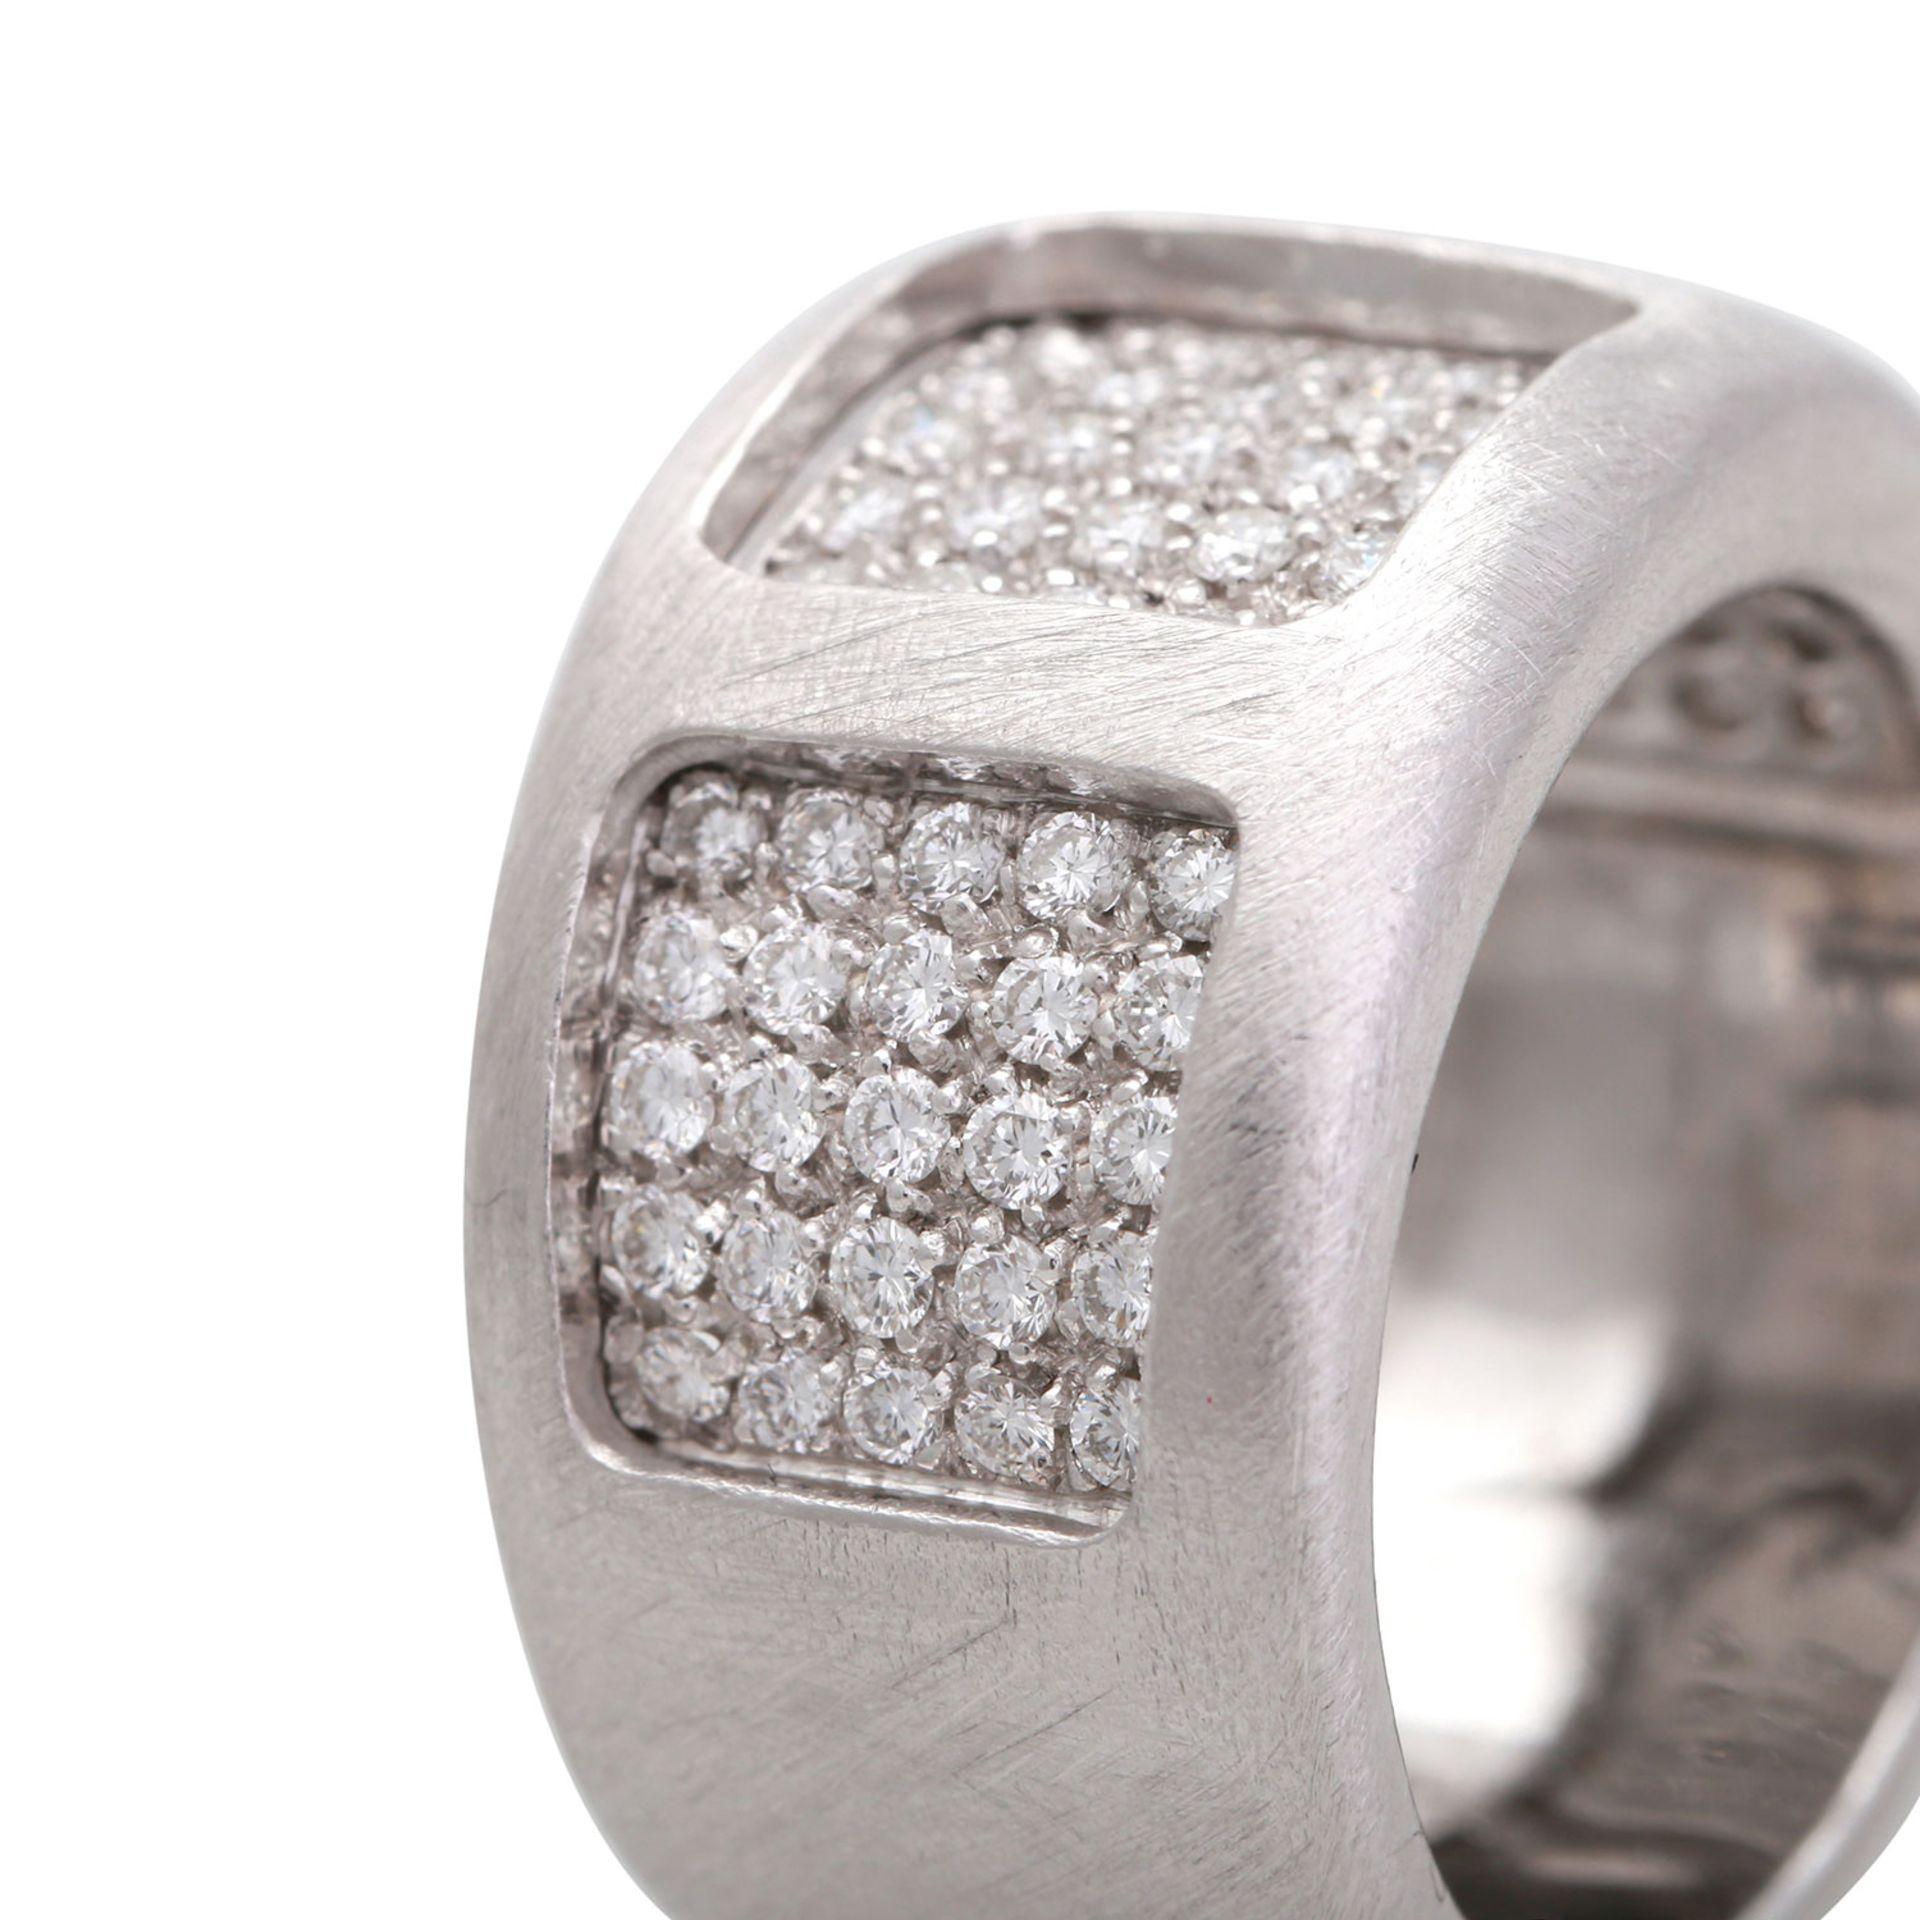 Los 103 - GIORGIO VISCONTI Ring mit 75 Diamanten, zus. ca. 0,75 ct, FW (F-G) /VVS - VS, WG 18K, RW 54,